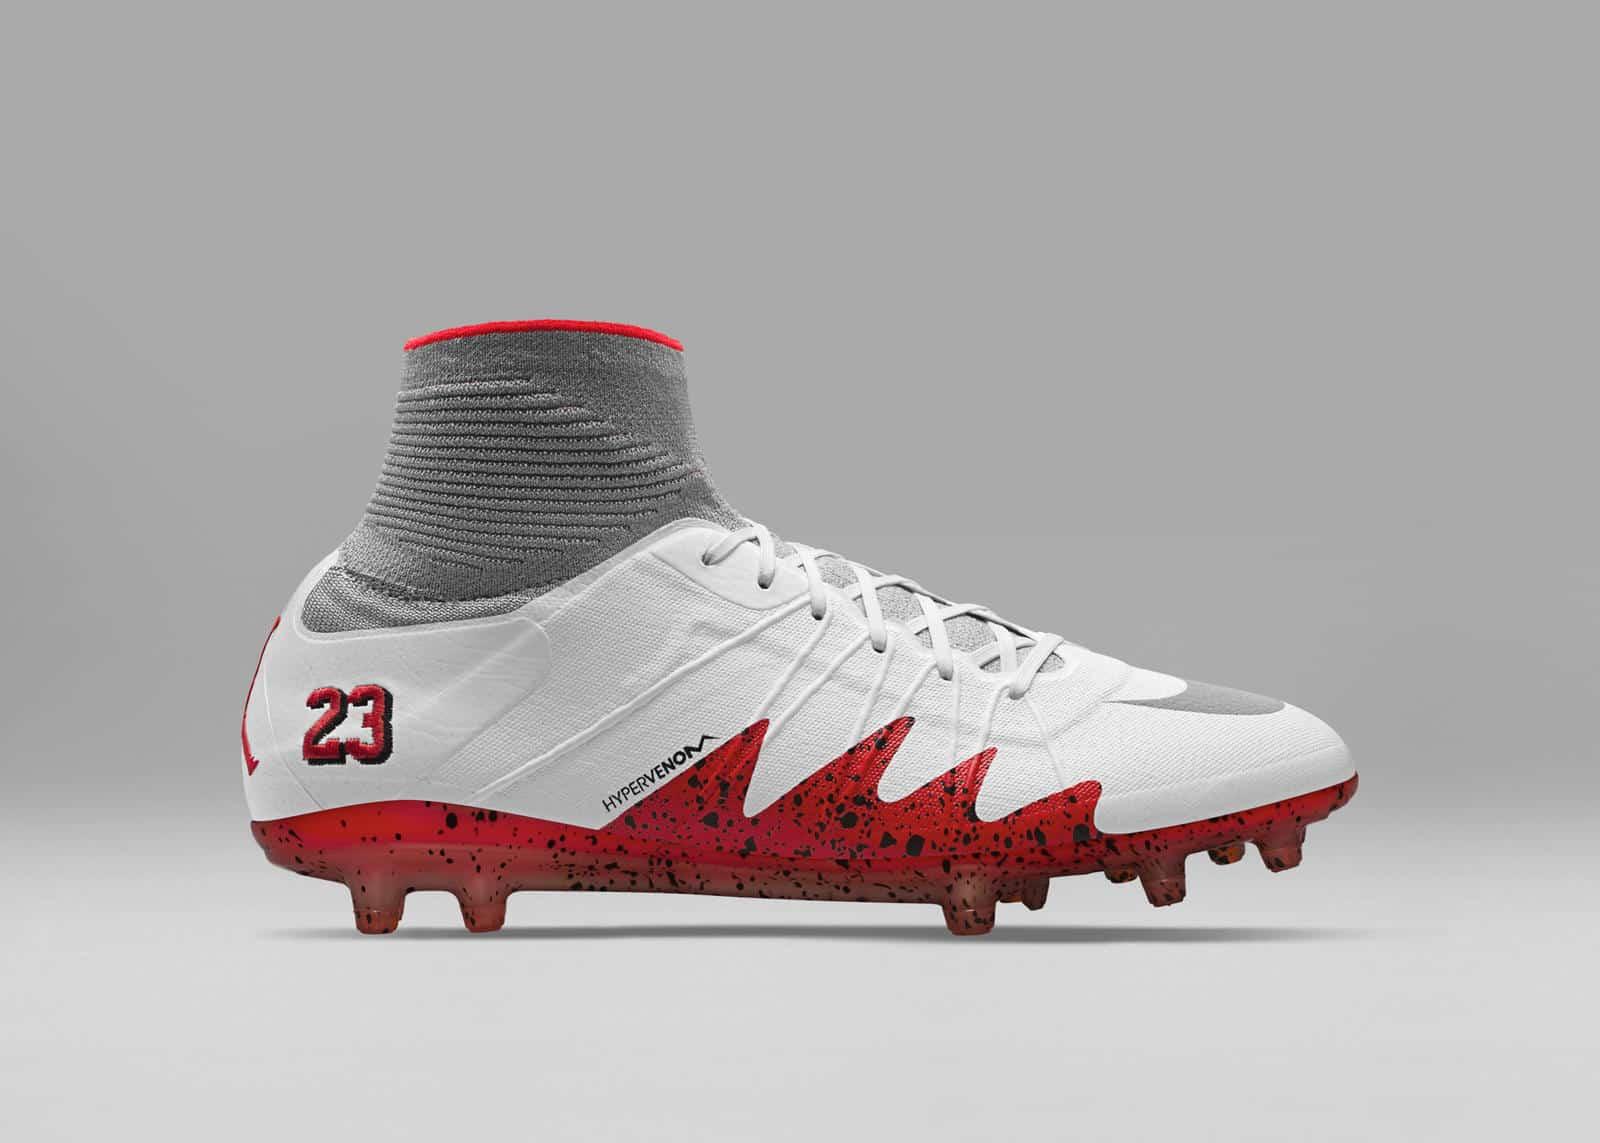 chaussure-foot-nike-hypervenom-neymar-jordan-blanc-octobre-2016